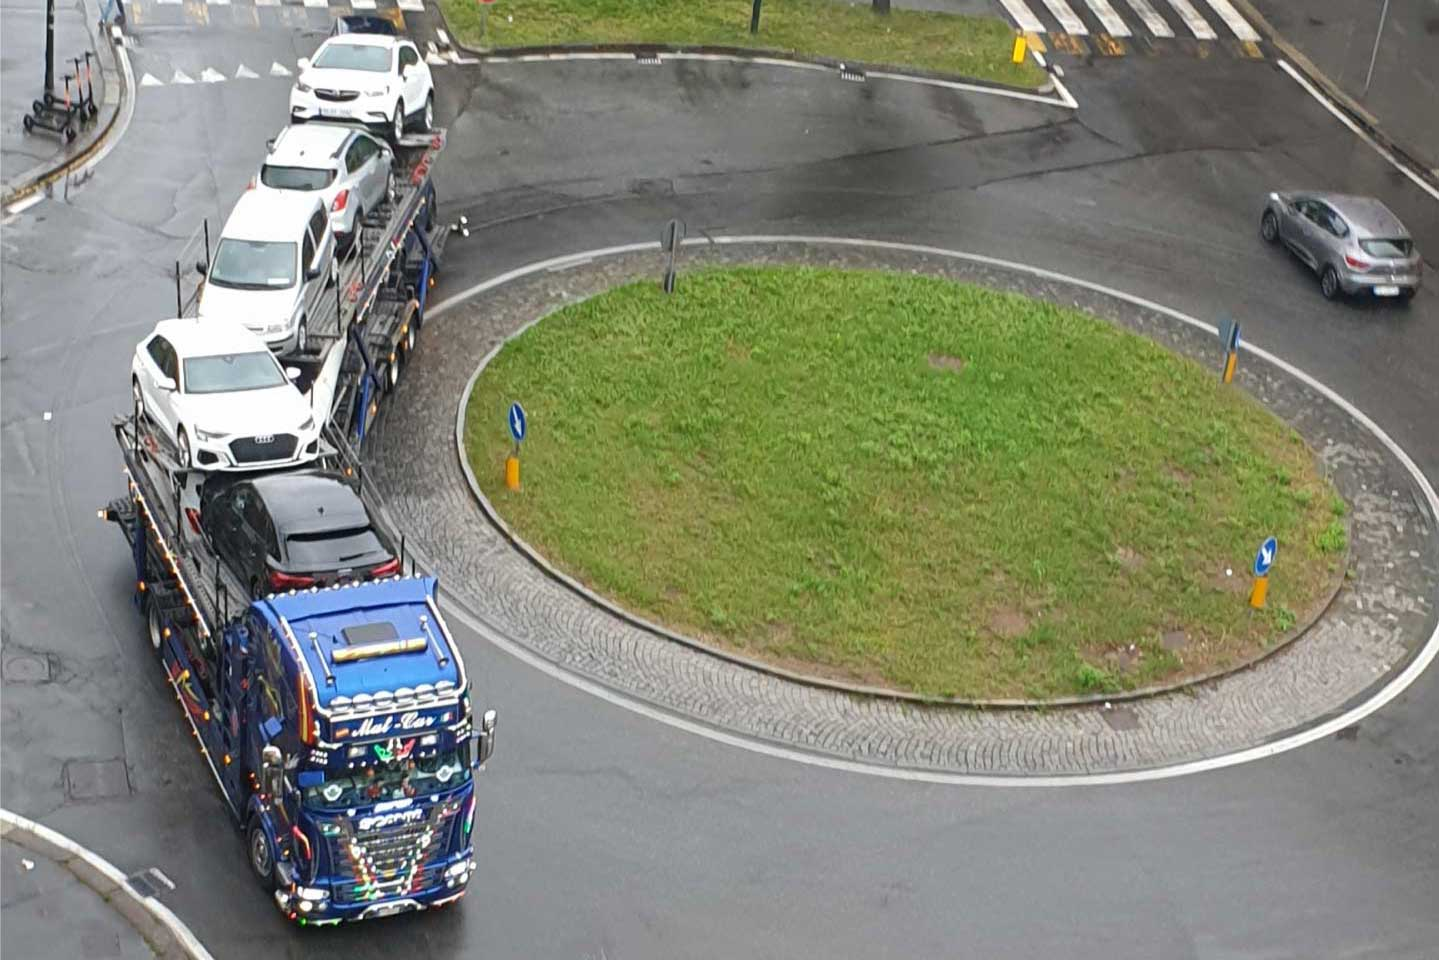 Mat_car_autotrasporti_bisarca_web